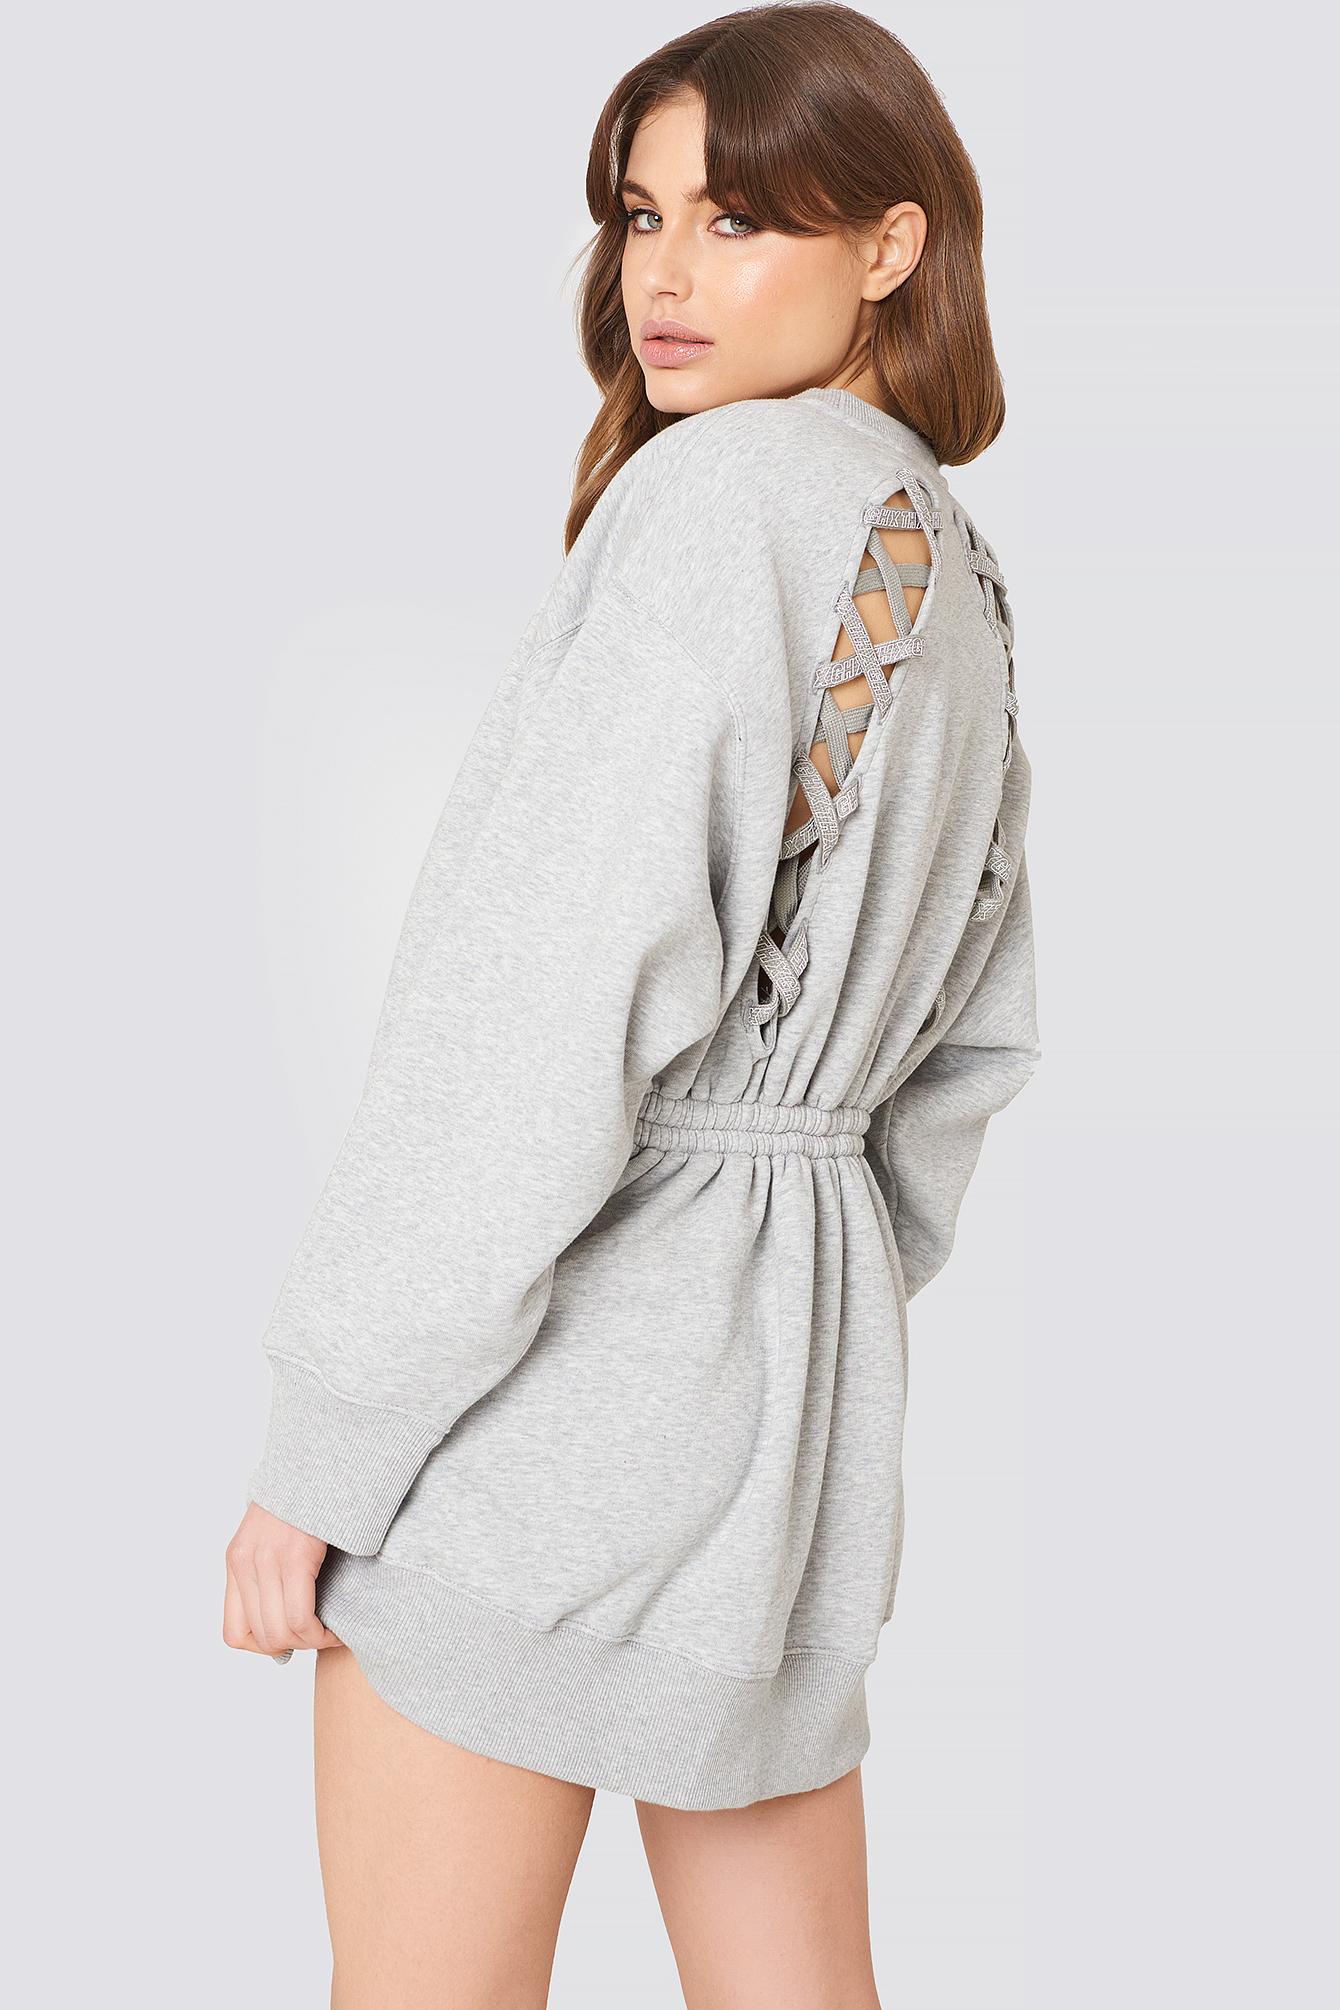 Gigi Hadid Open Back LS Sweatshirt Dress